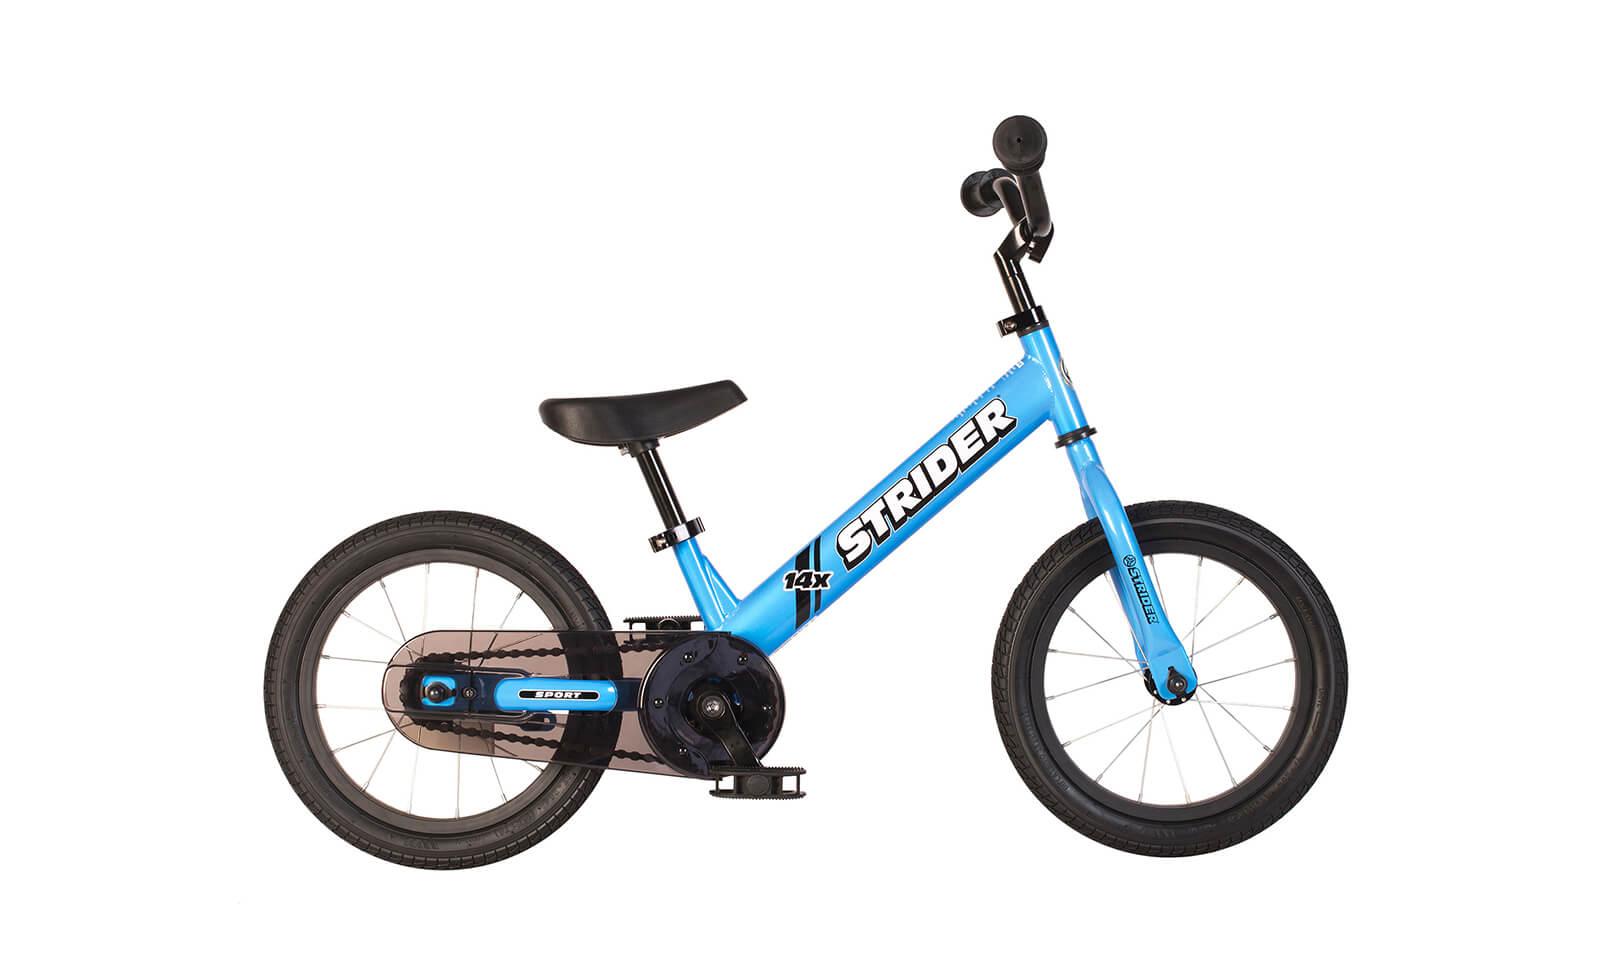 Strider Balance Bikes Product Image